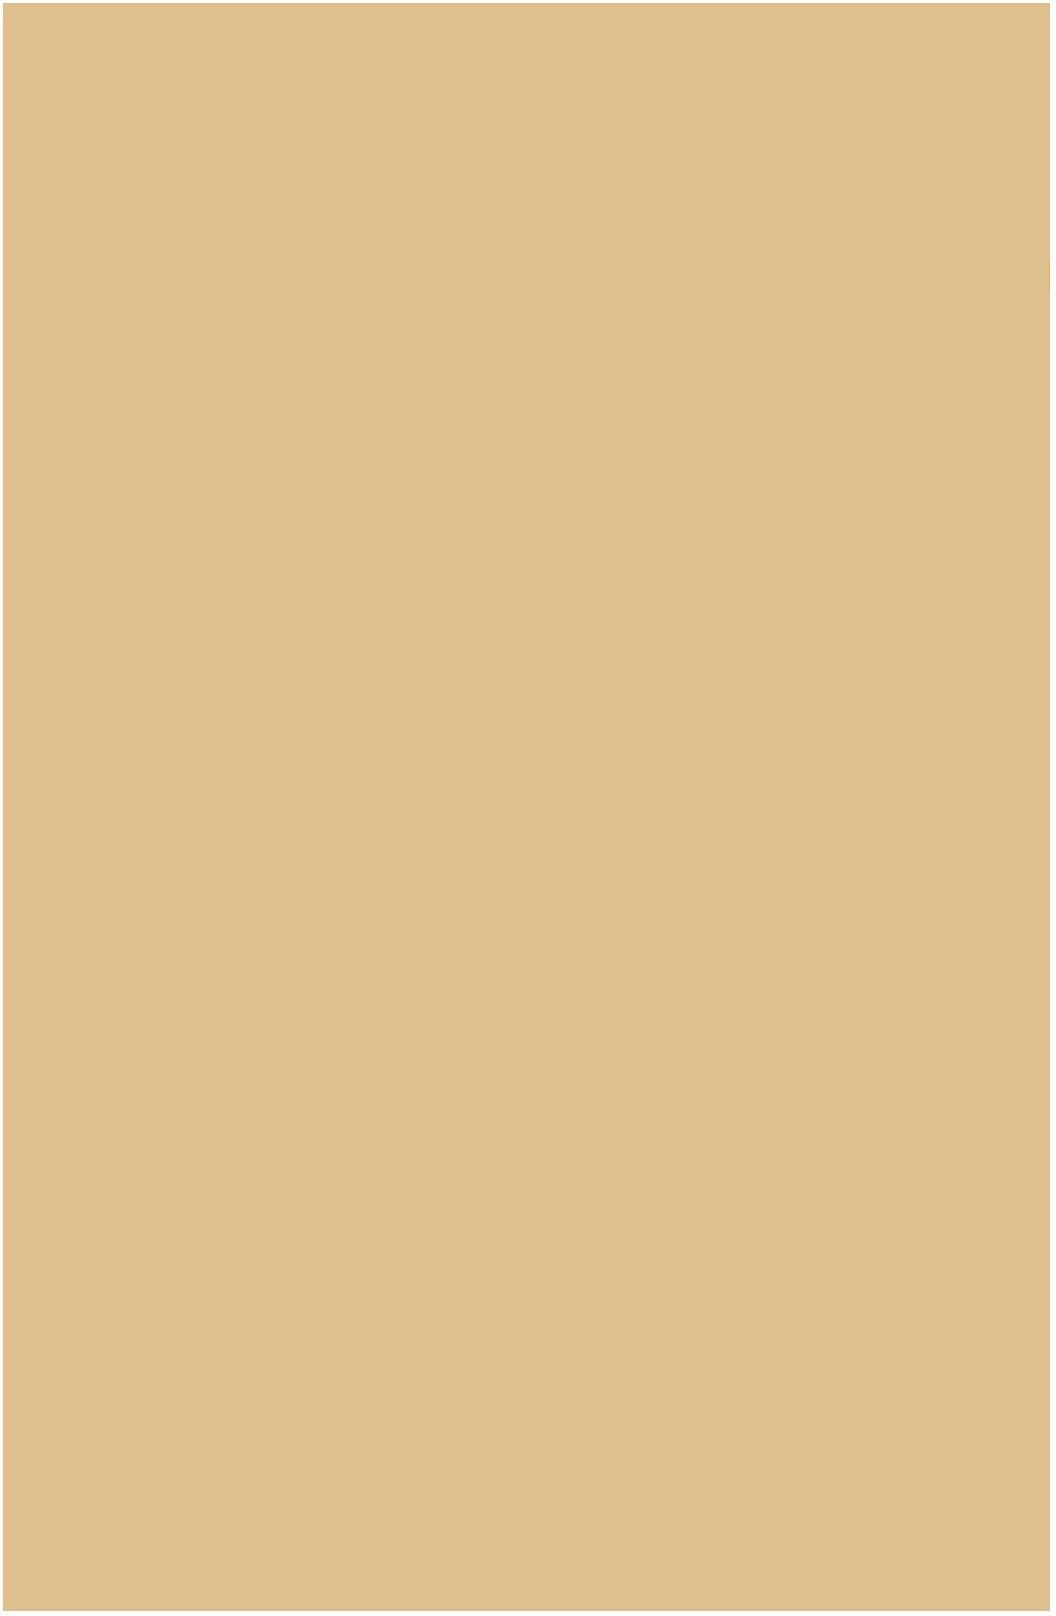 Karton kolor A1 piaskowy Lux Interdruk 101